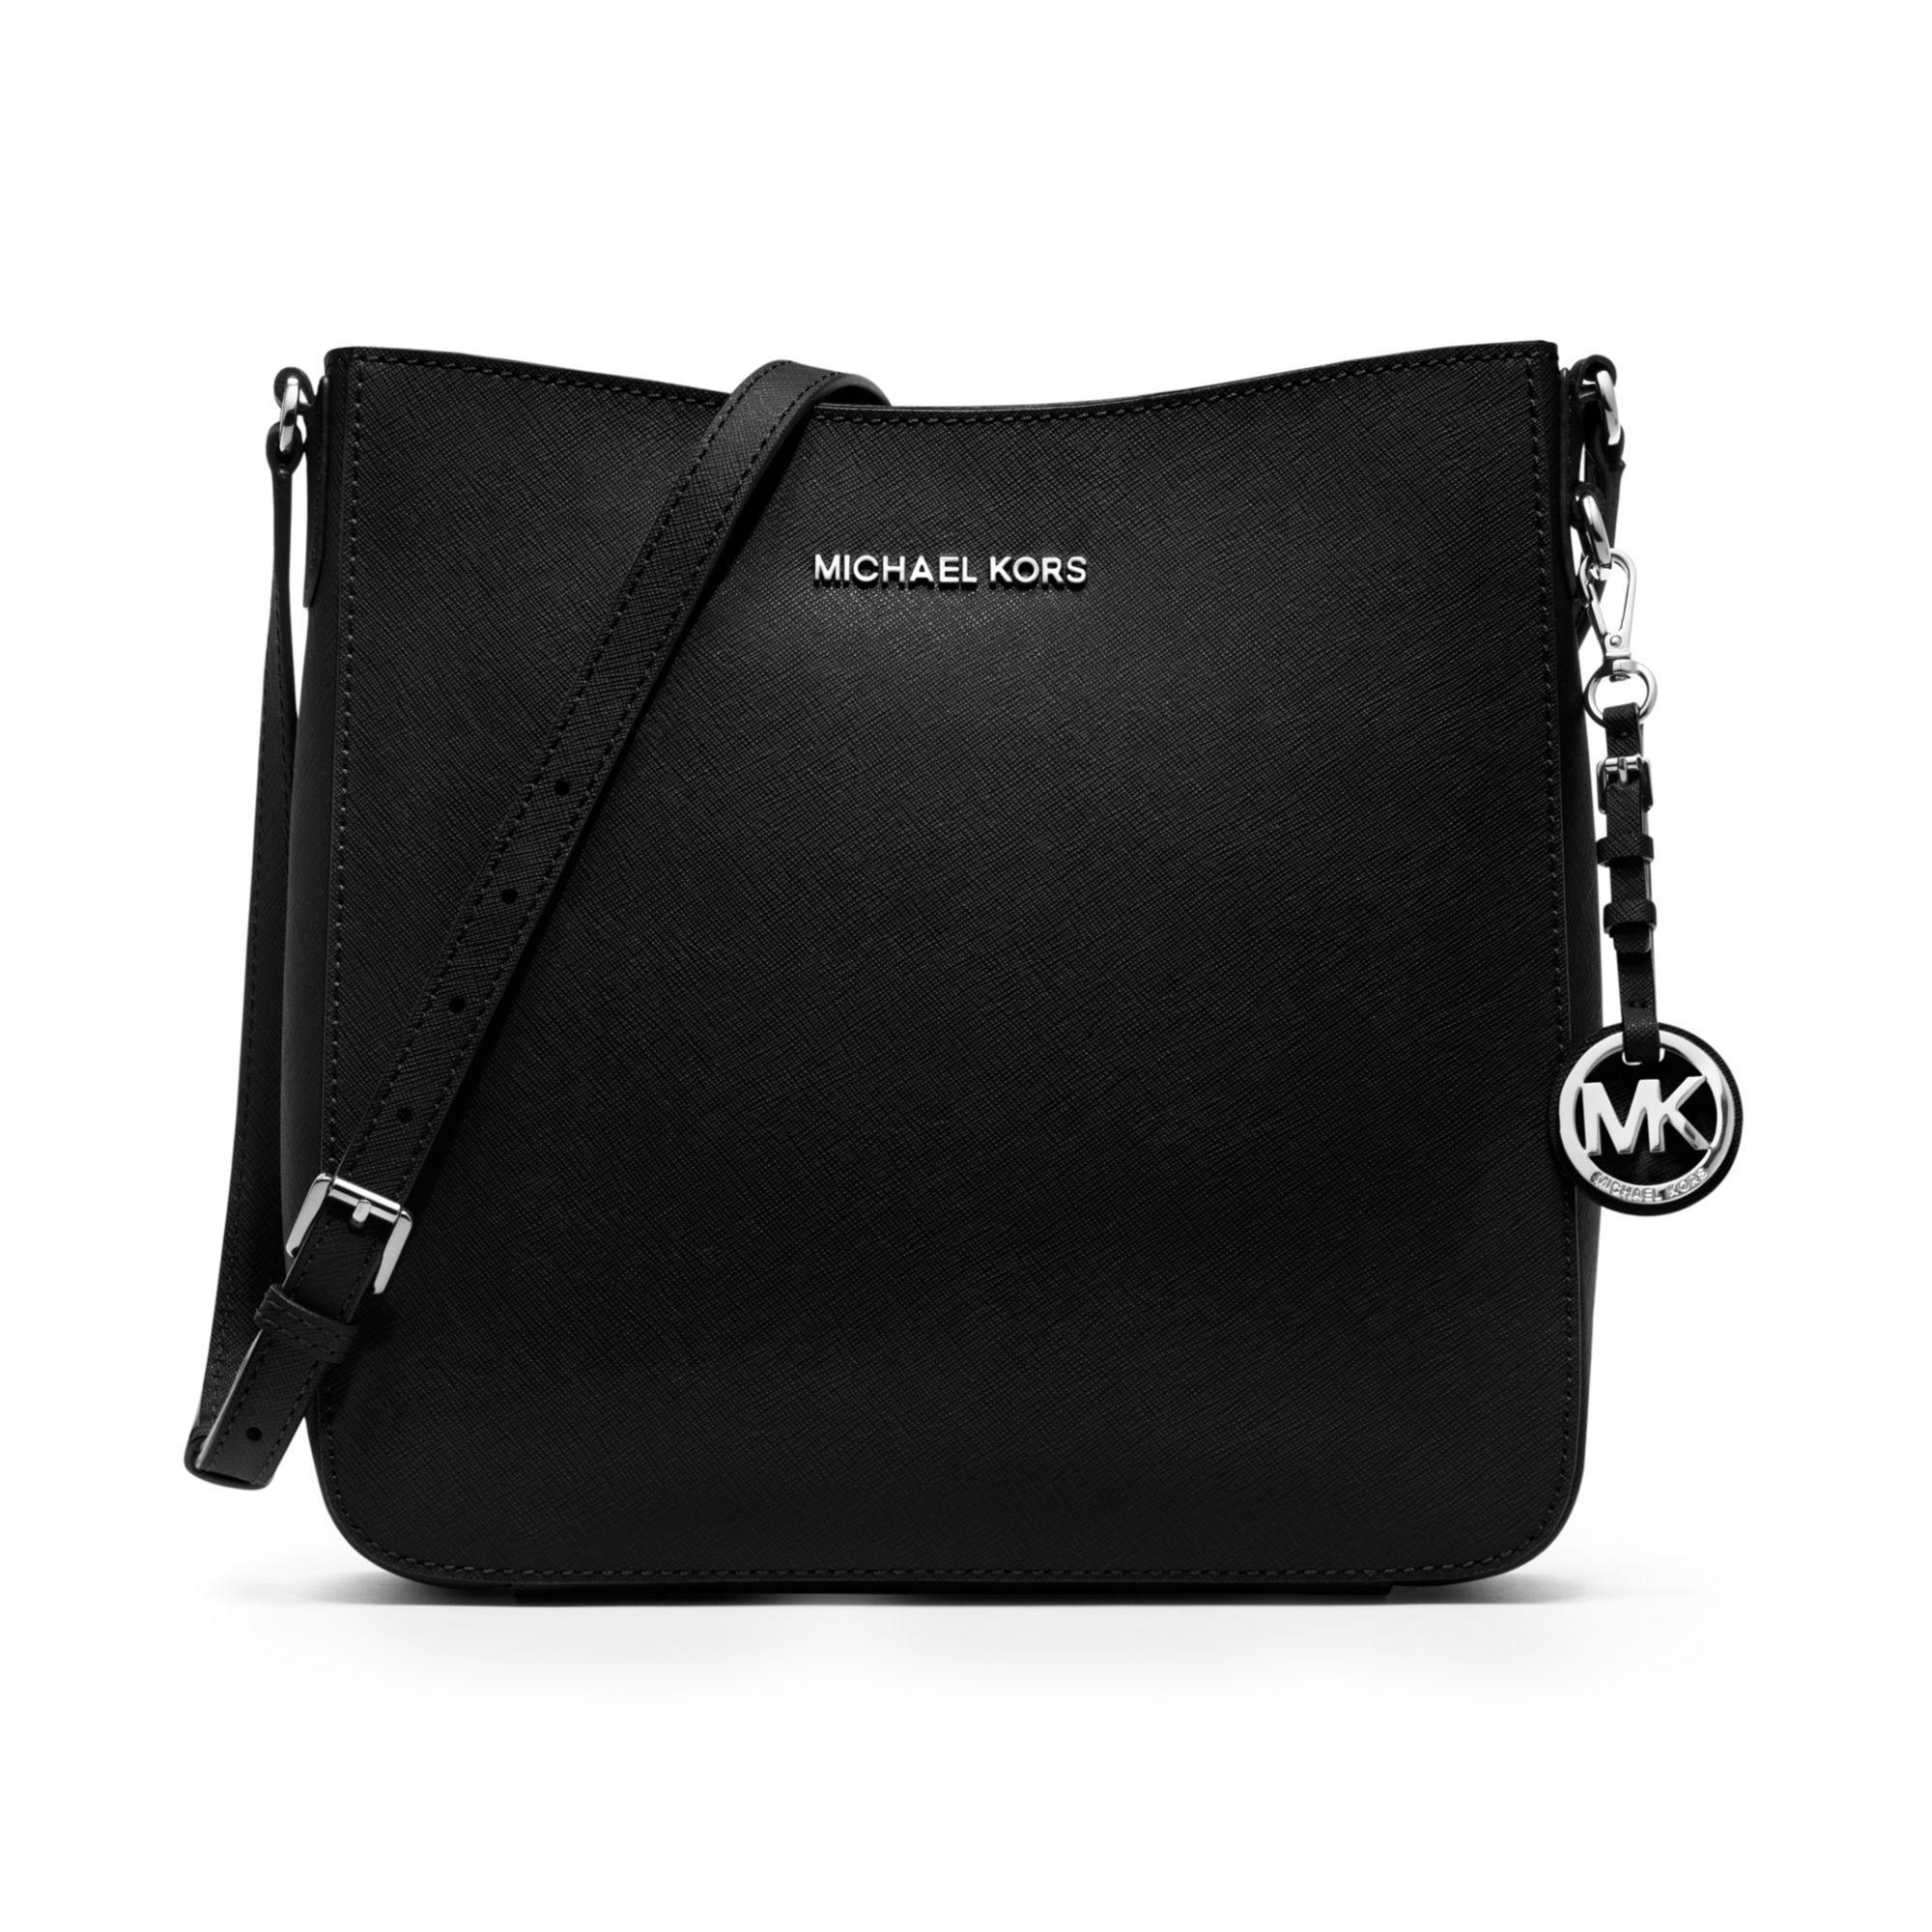 45b448d541d3 Lyst - Michael Kors Jet Set Travel Large Saffiano Messenger Bag in Black